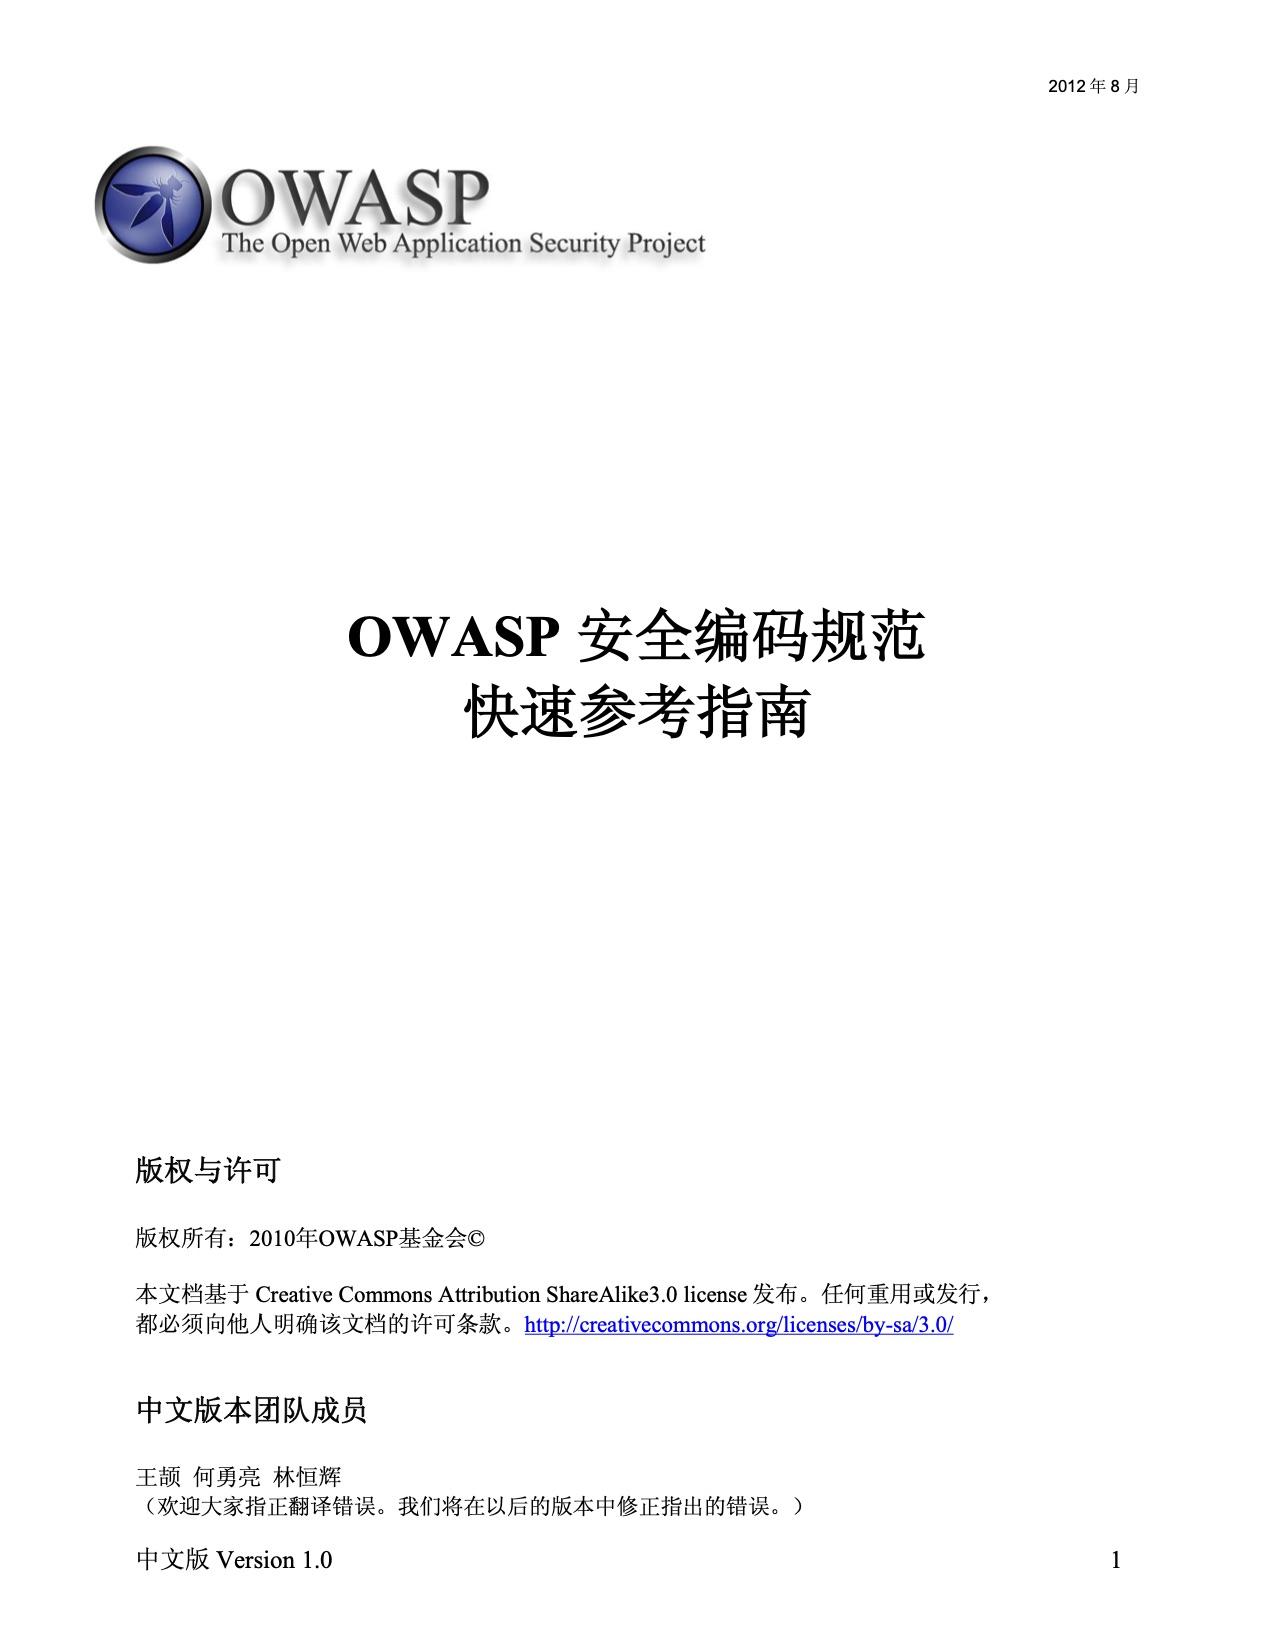 OWASP安全编码规范v1